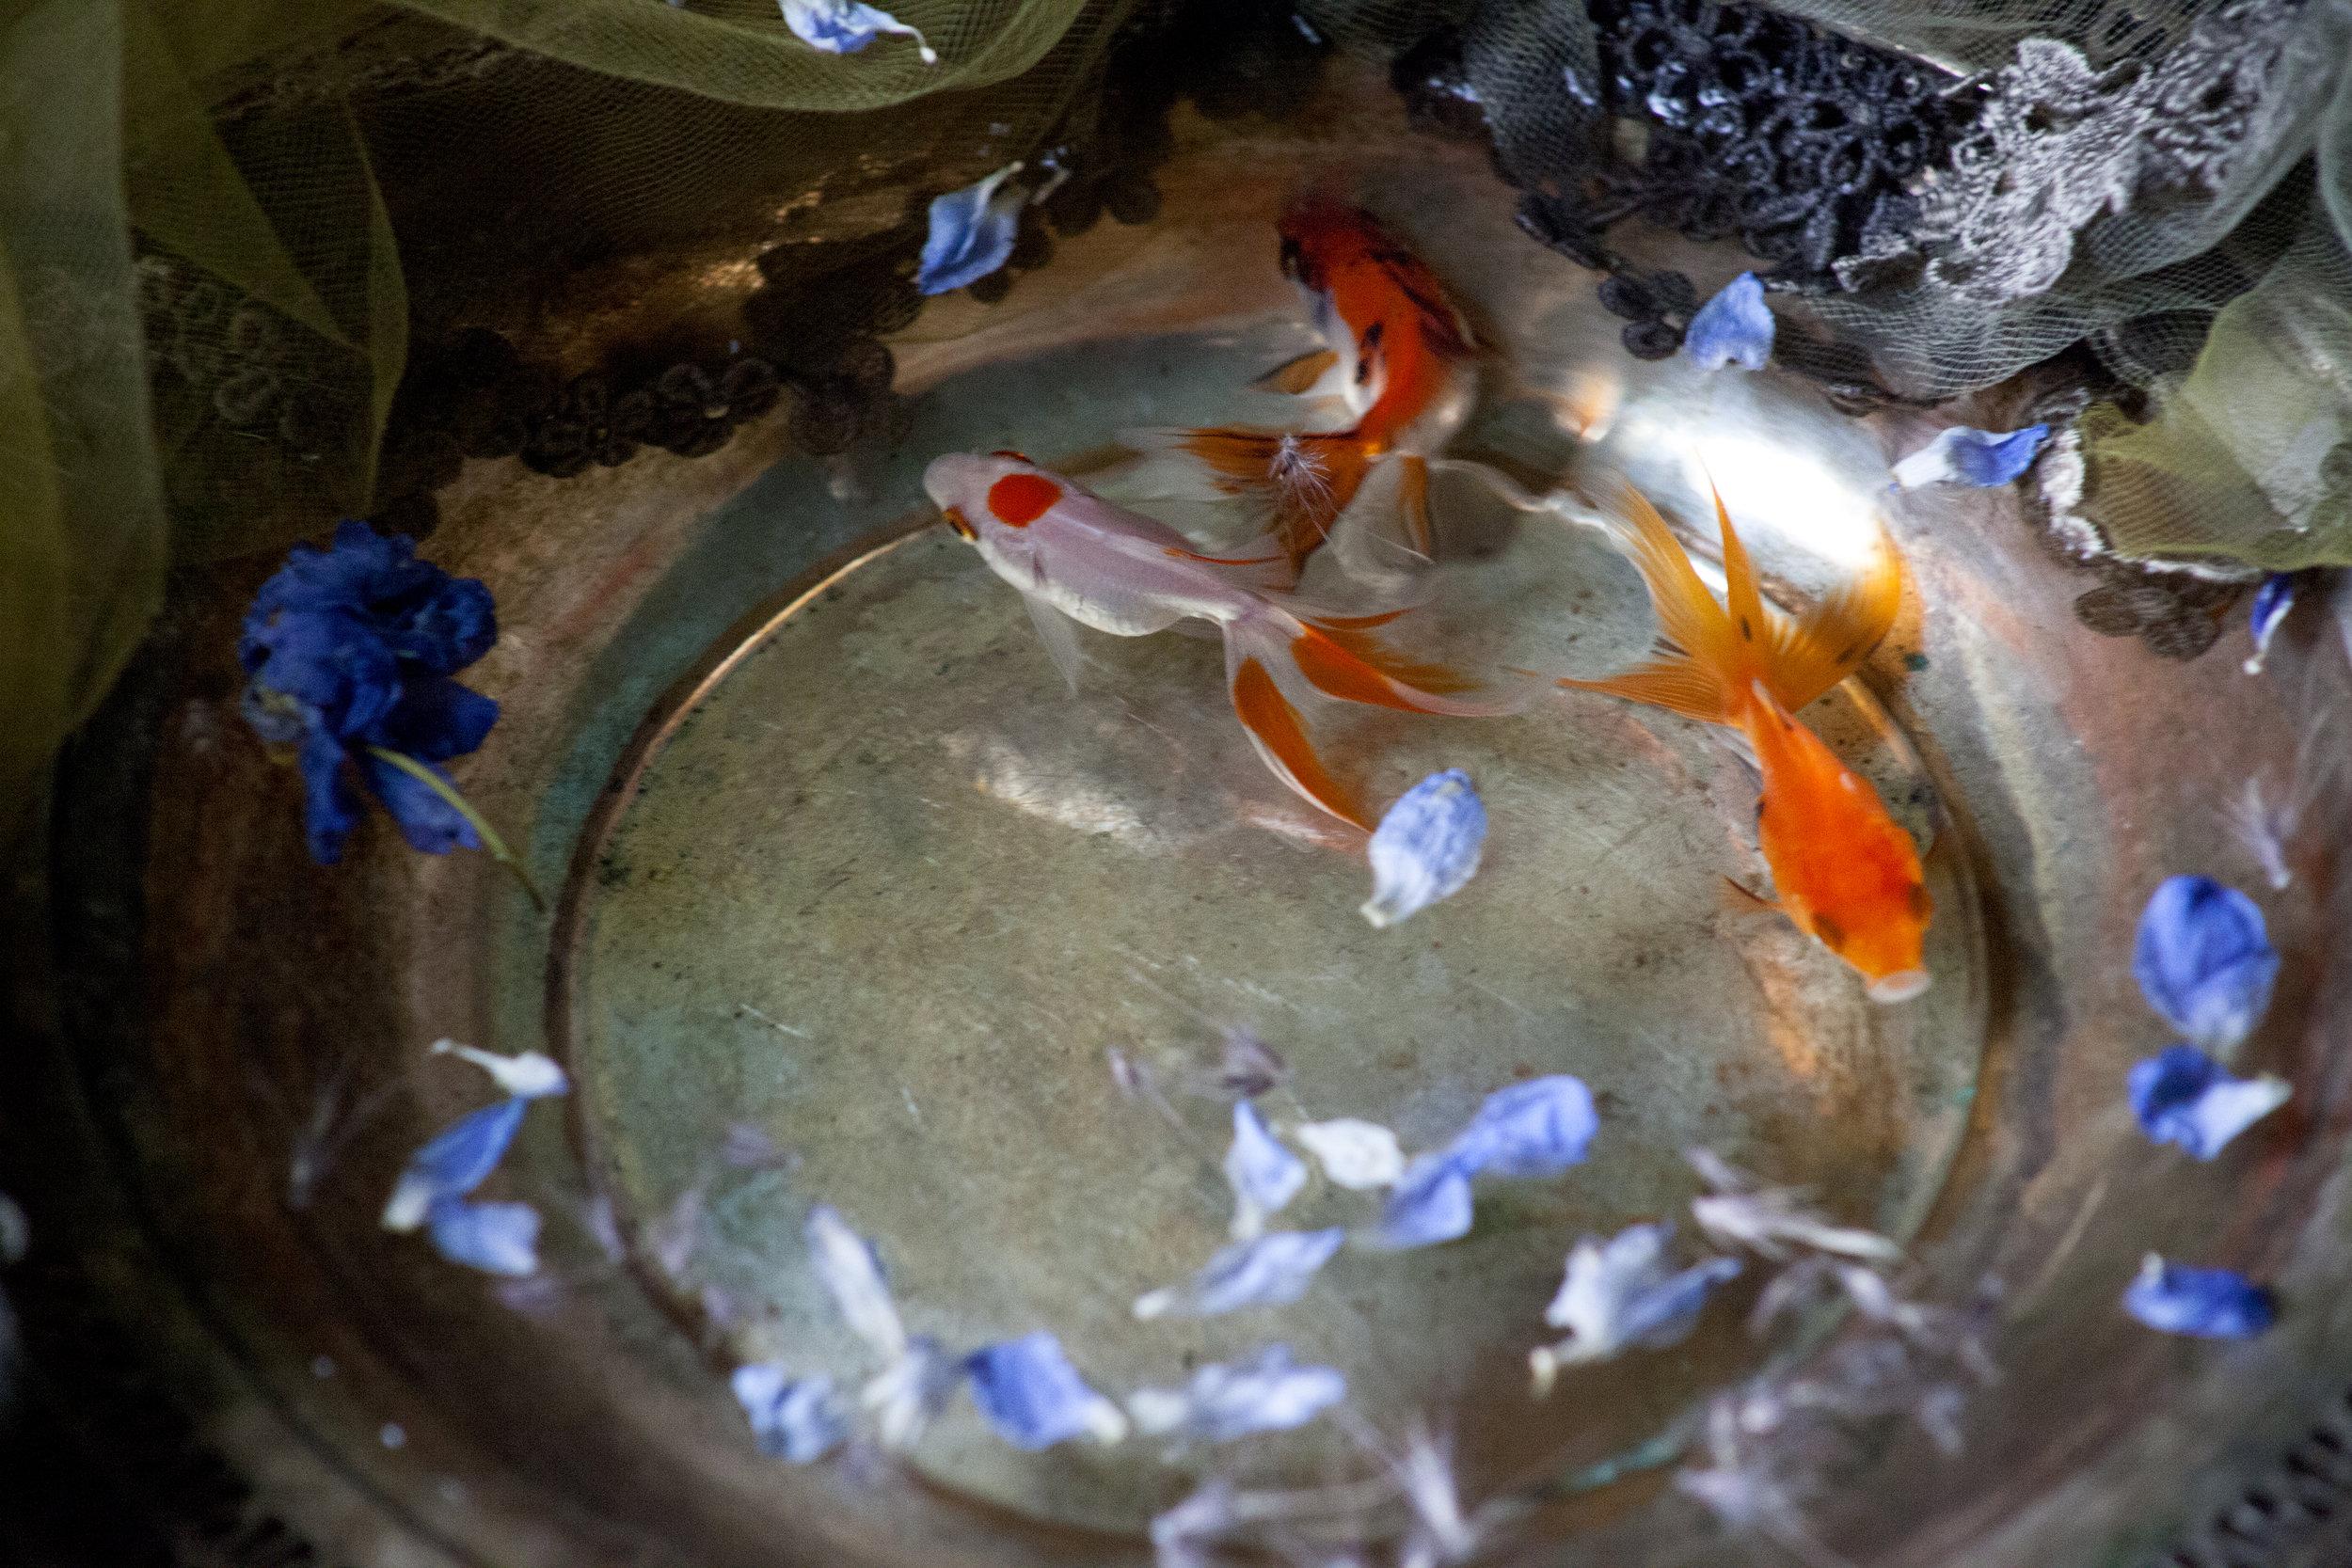 No Goldfish Were Harmed #4